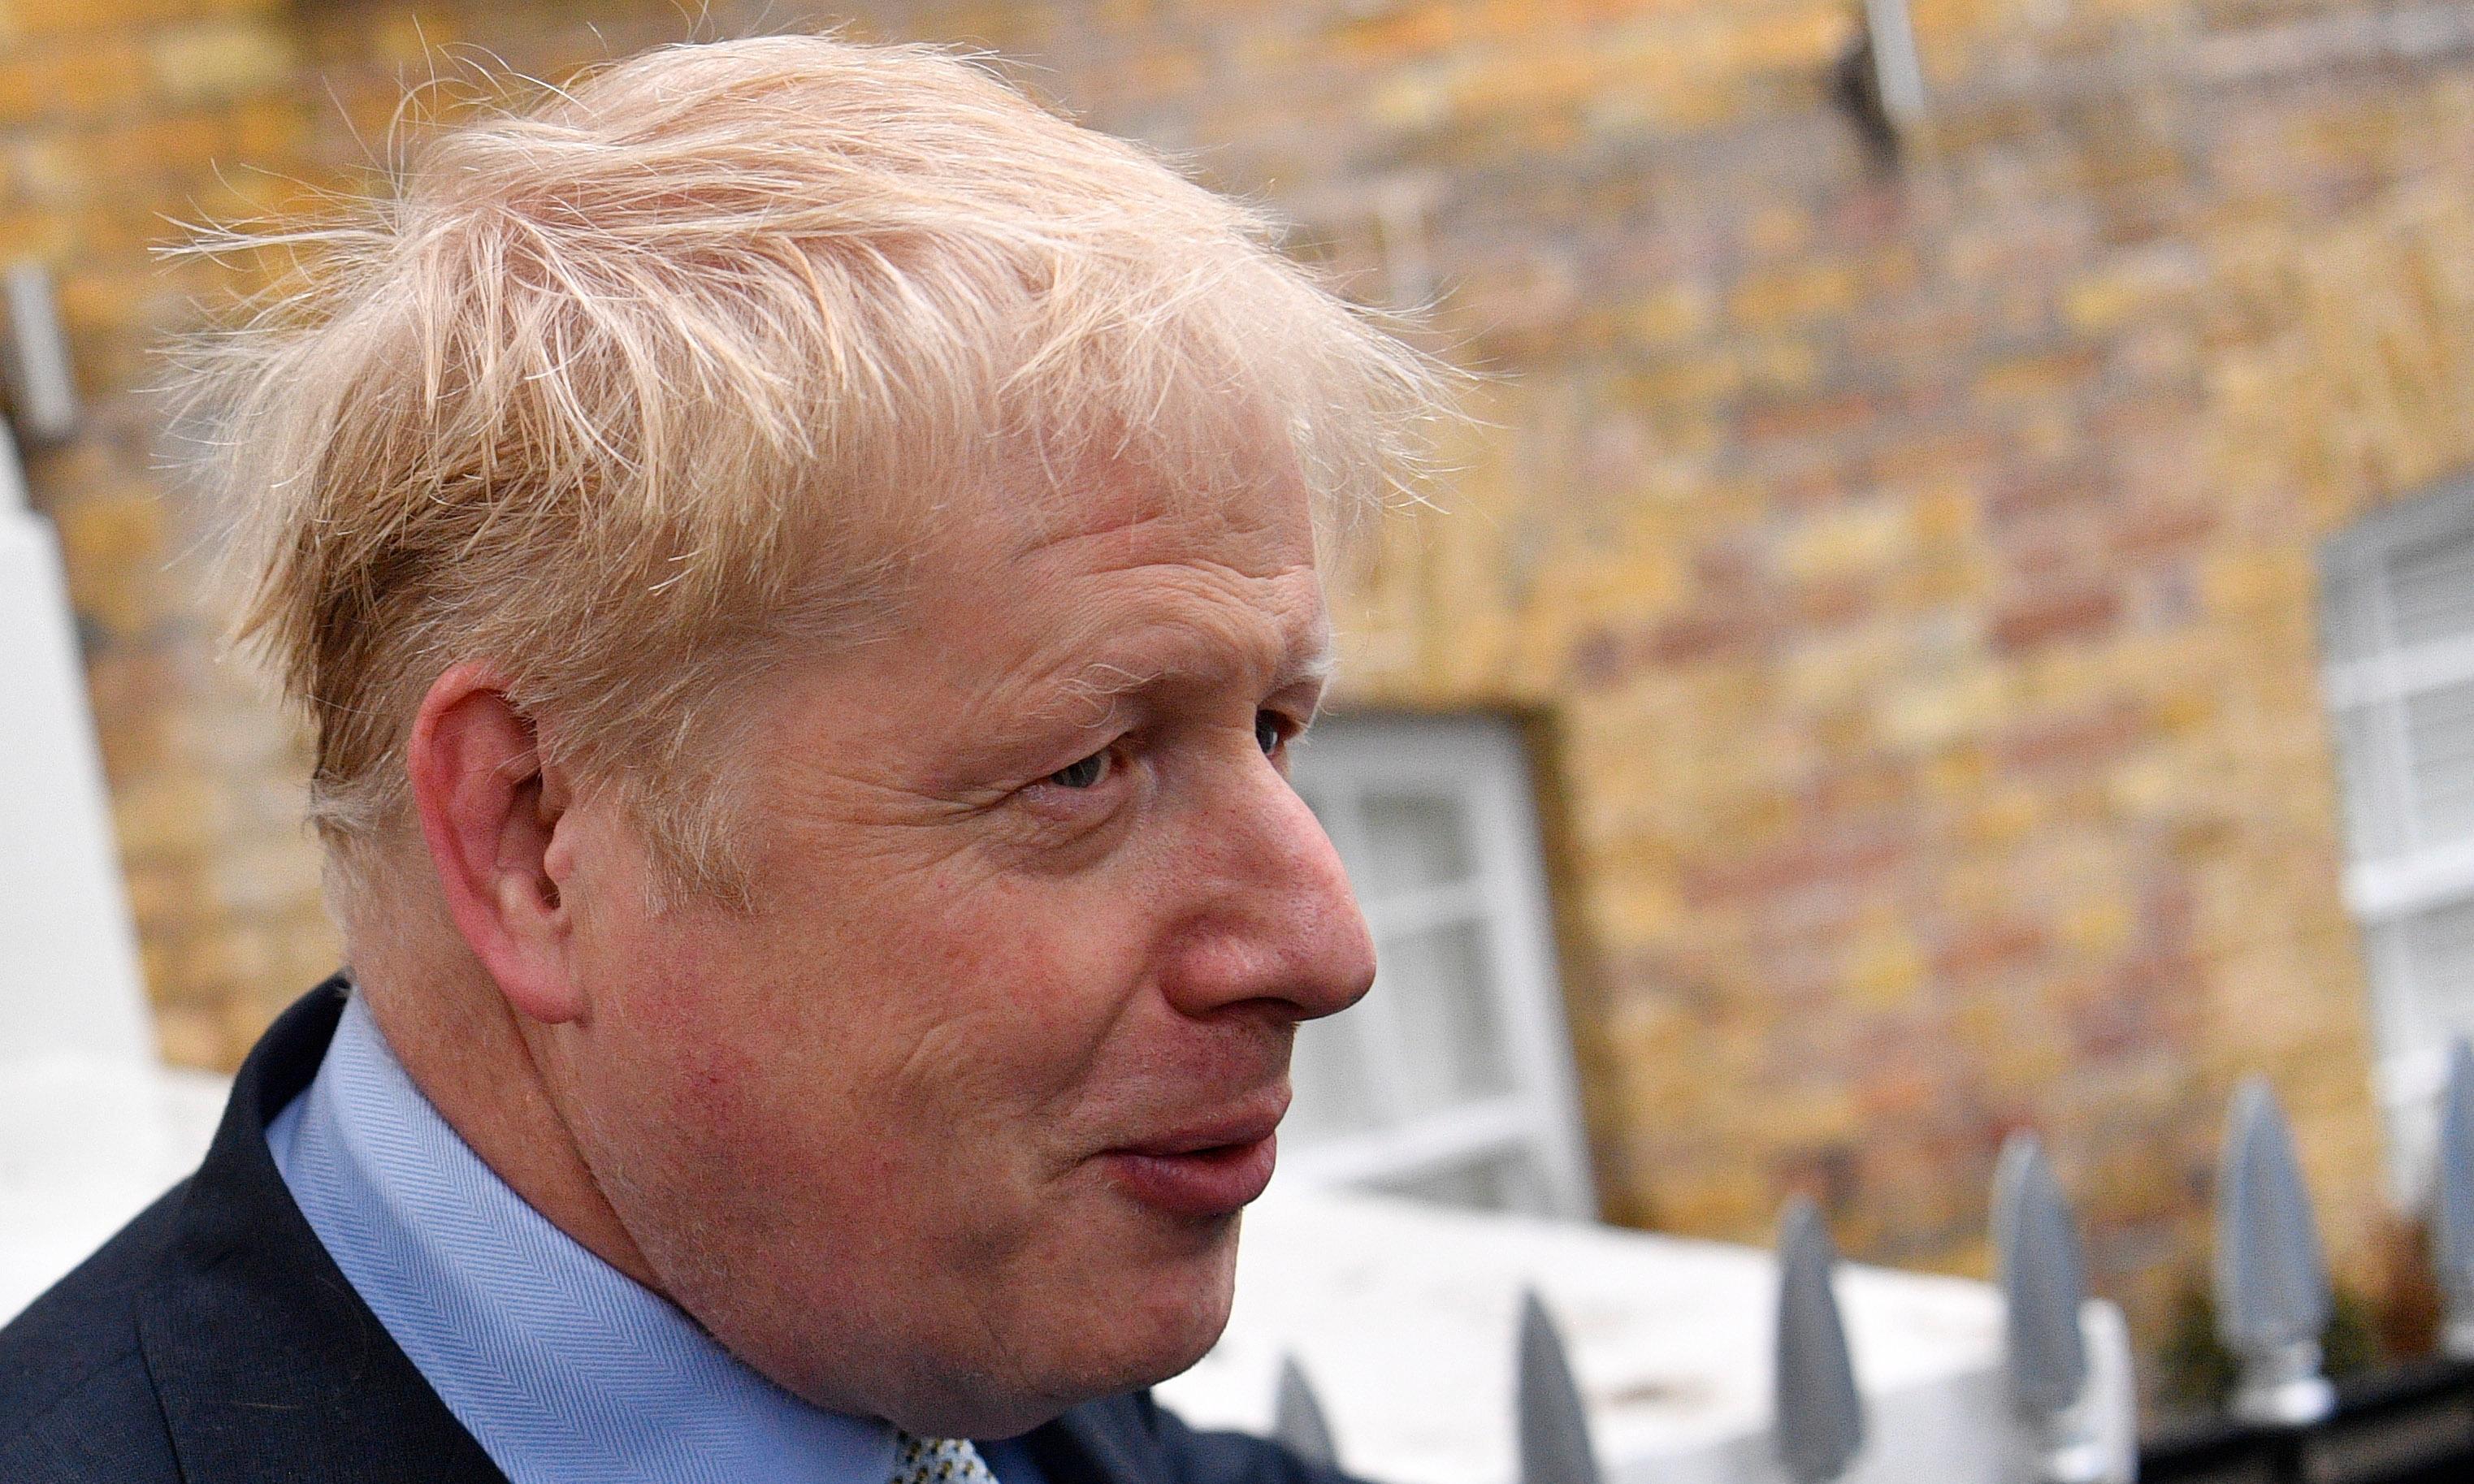 'Mini-Trump across the Channel': EU media on Boris Johnson as British PM